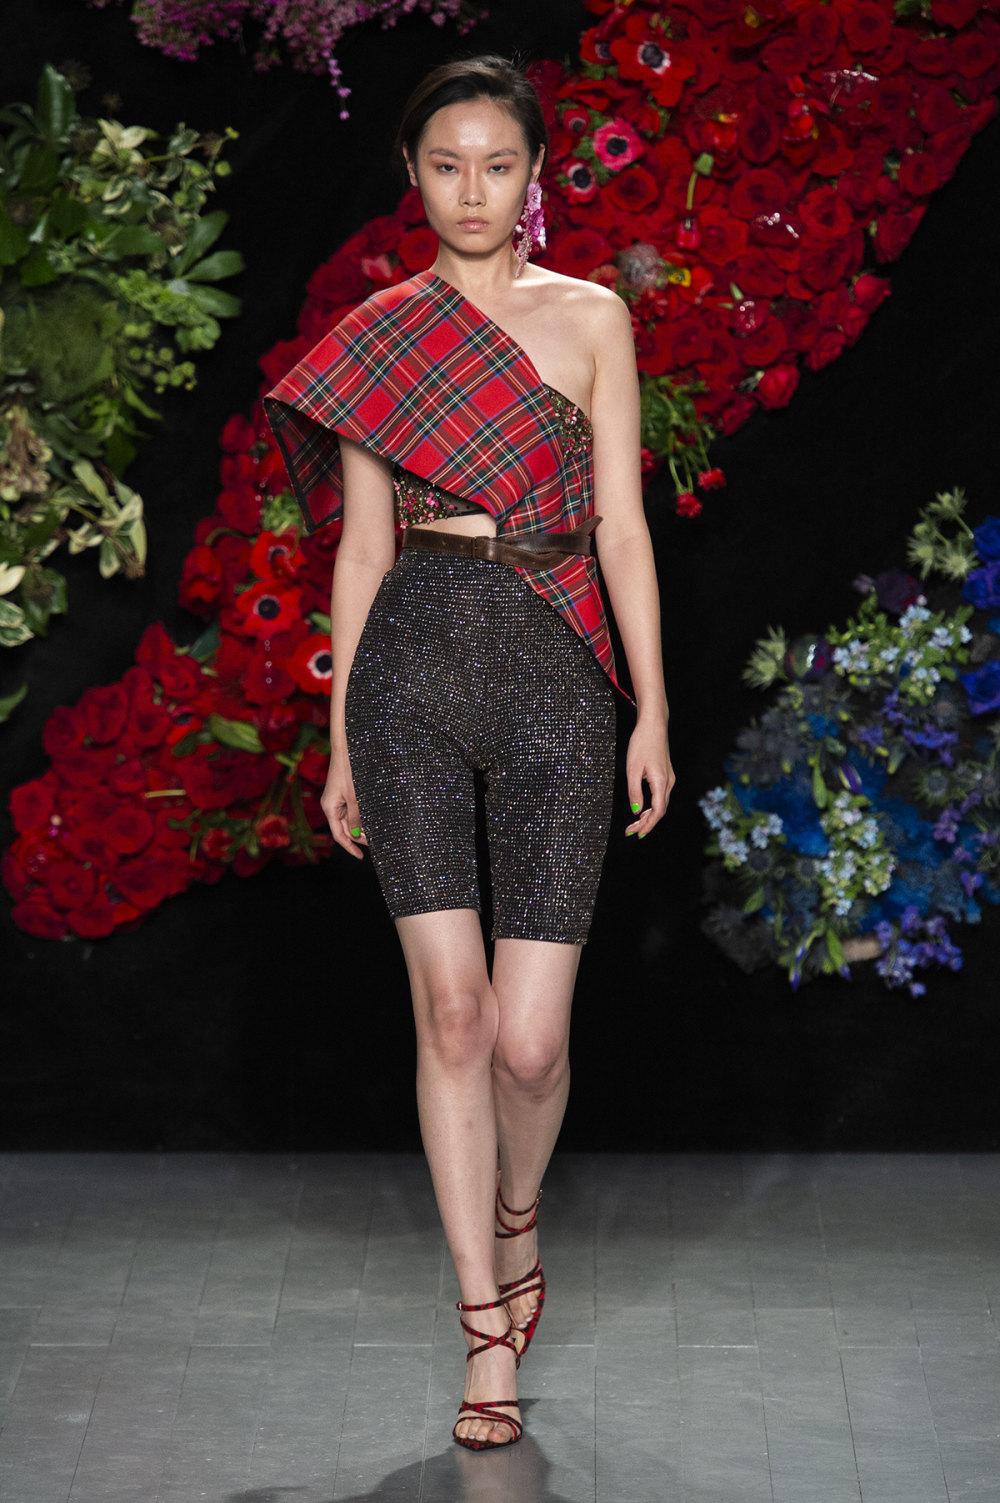 Roberta Einer时装系列格子呢西装外套收紧腰部霓虹色腰带连帽衫-5.jpg